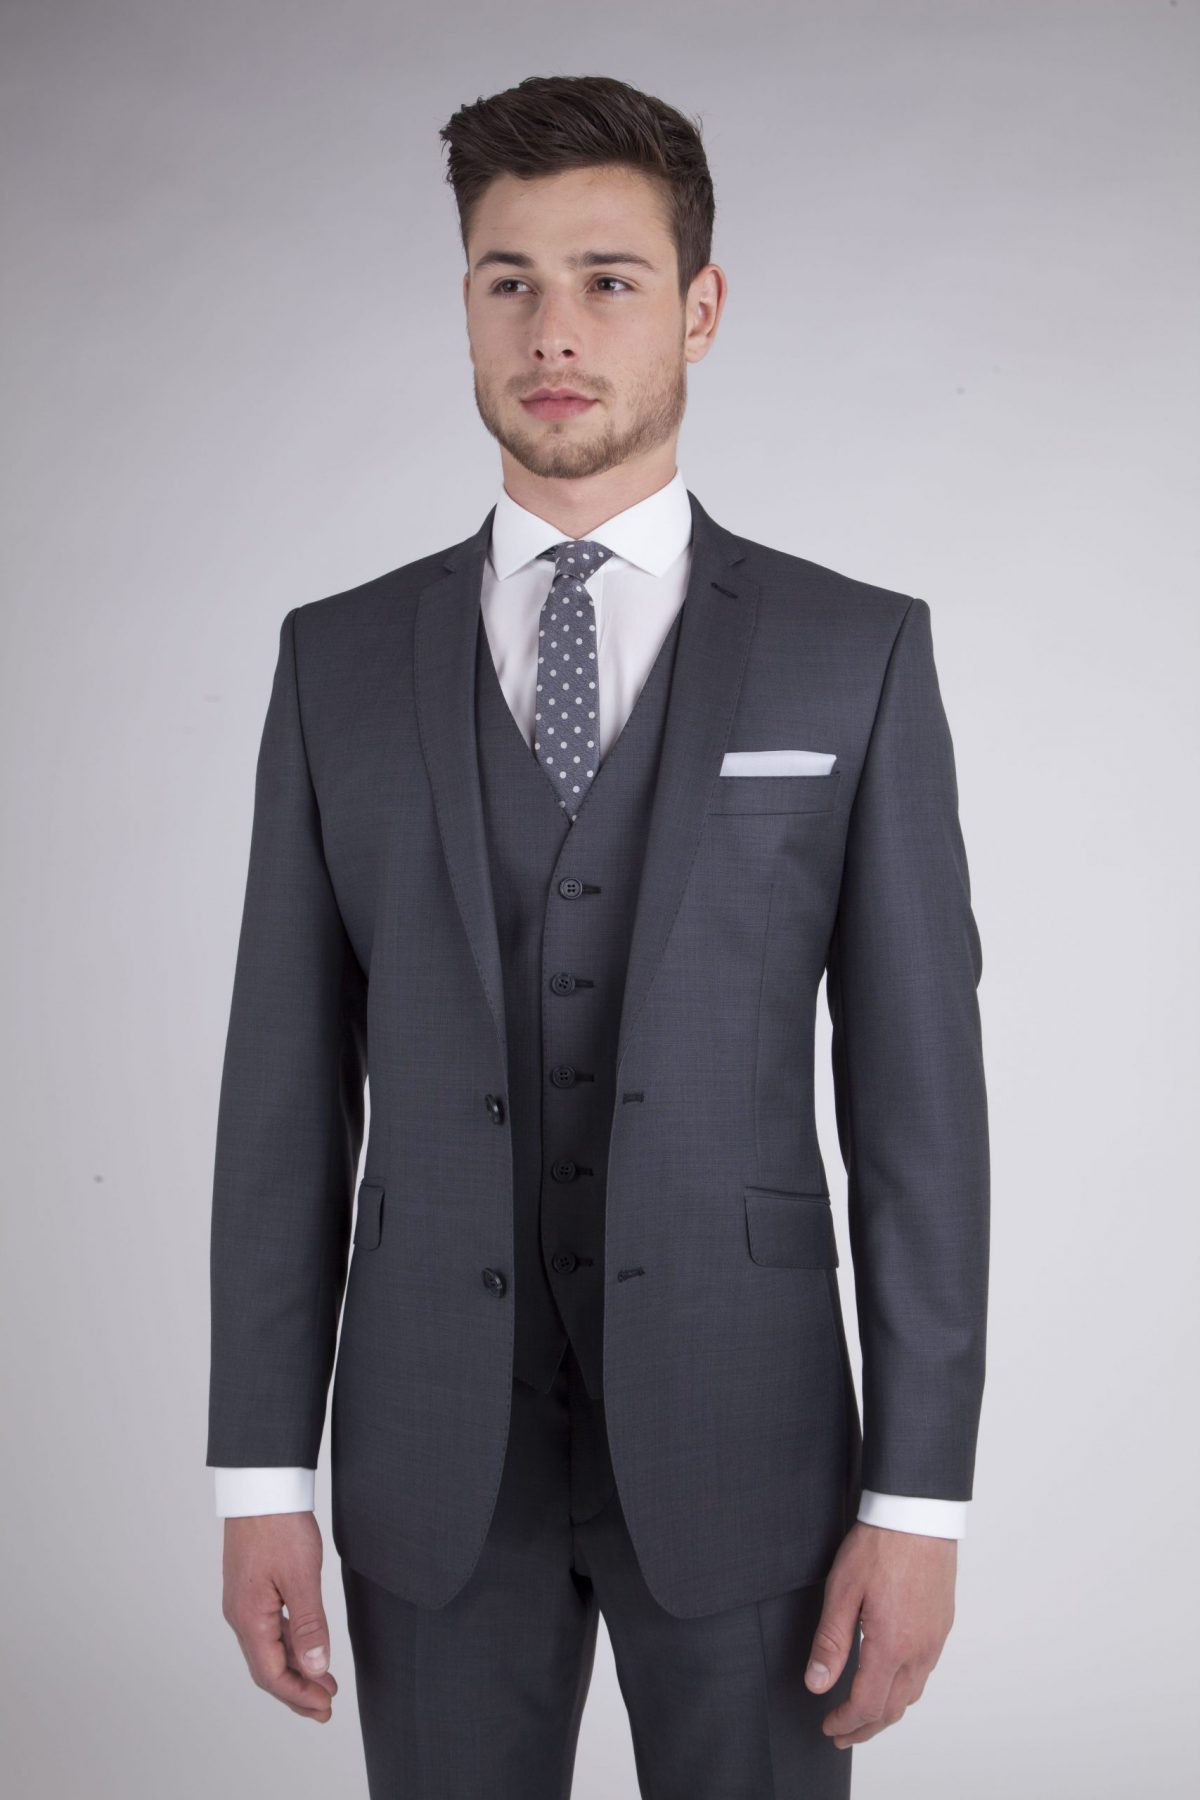 Charcoal Rental Suit scaled - - Con Murphys Menswear